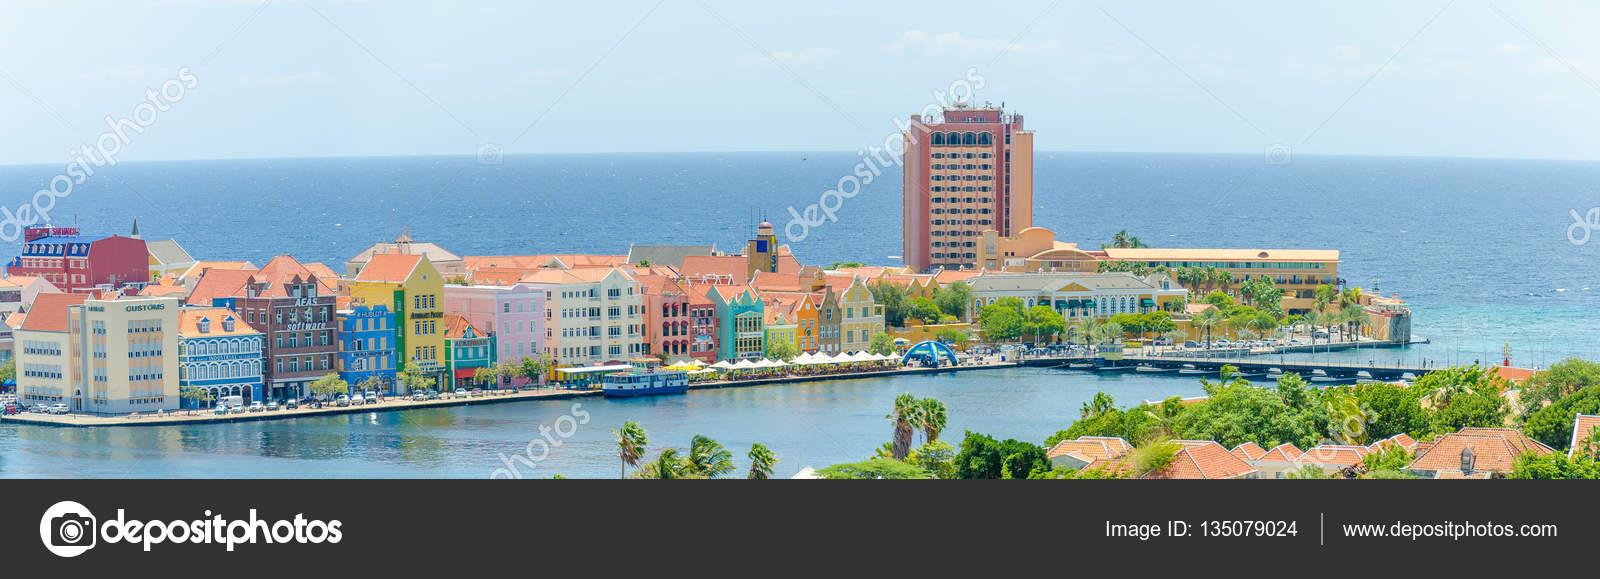 Vista de Willemstad centro con coloridas fachadas en Curacao